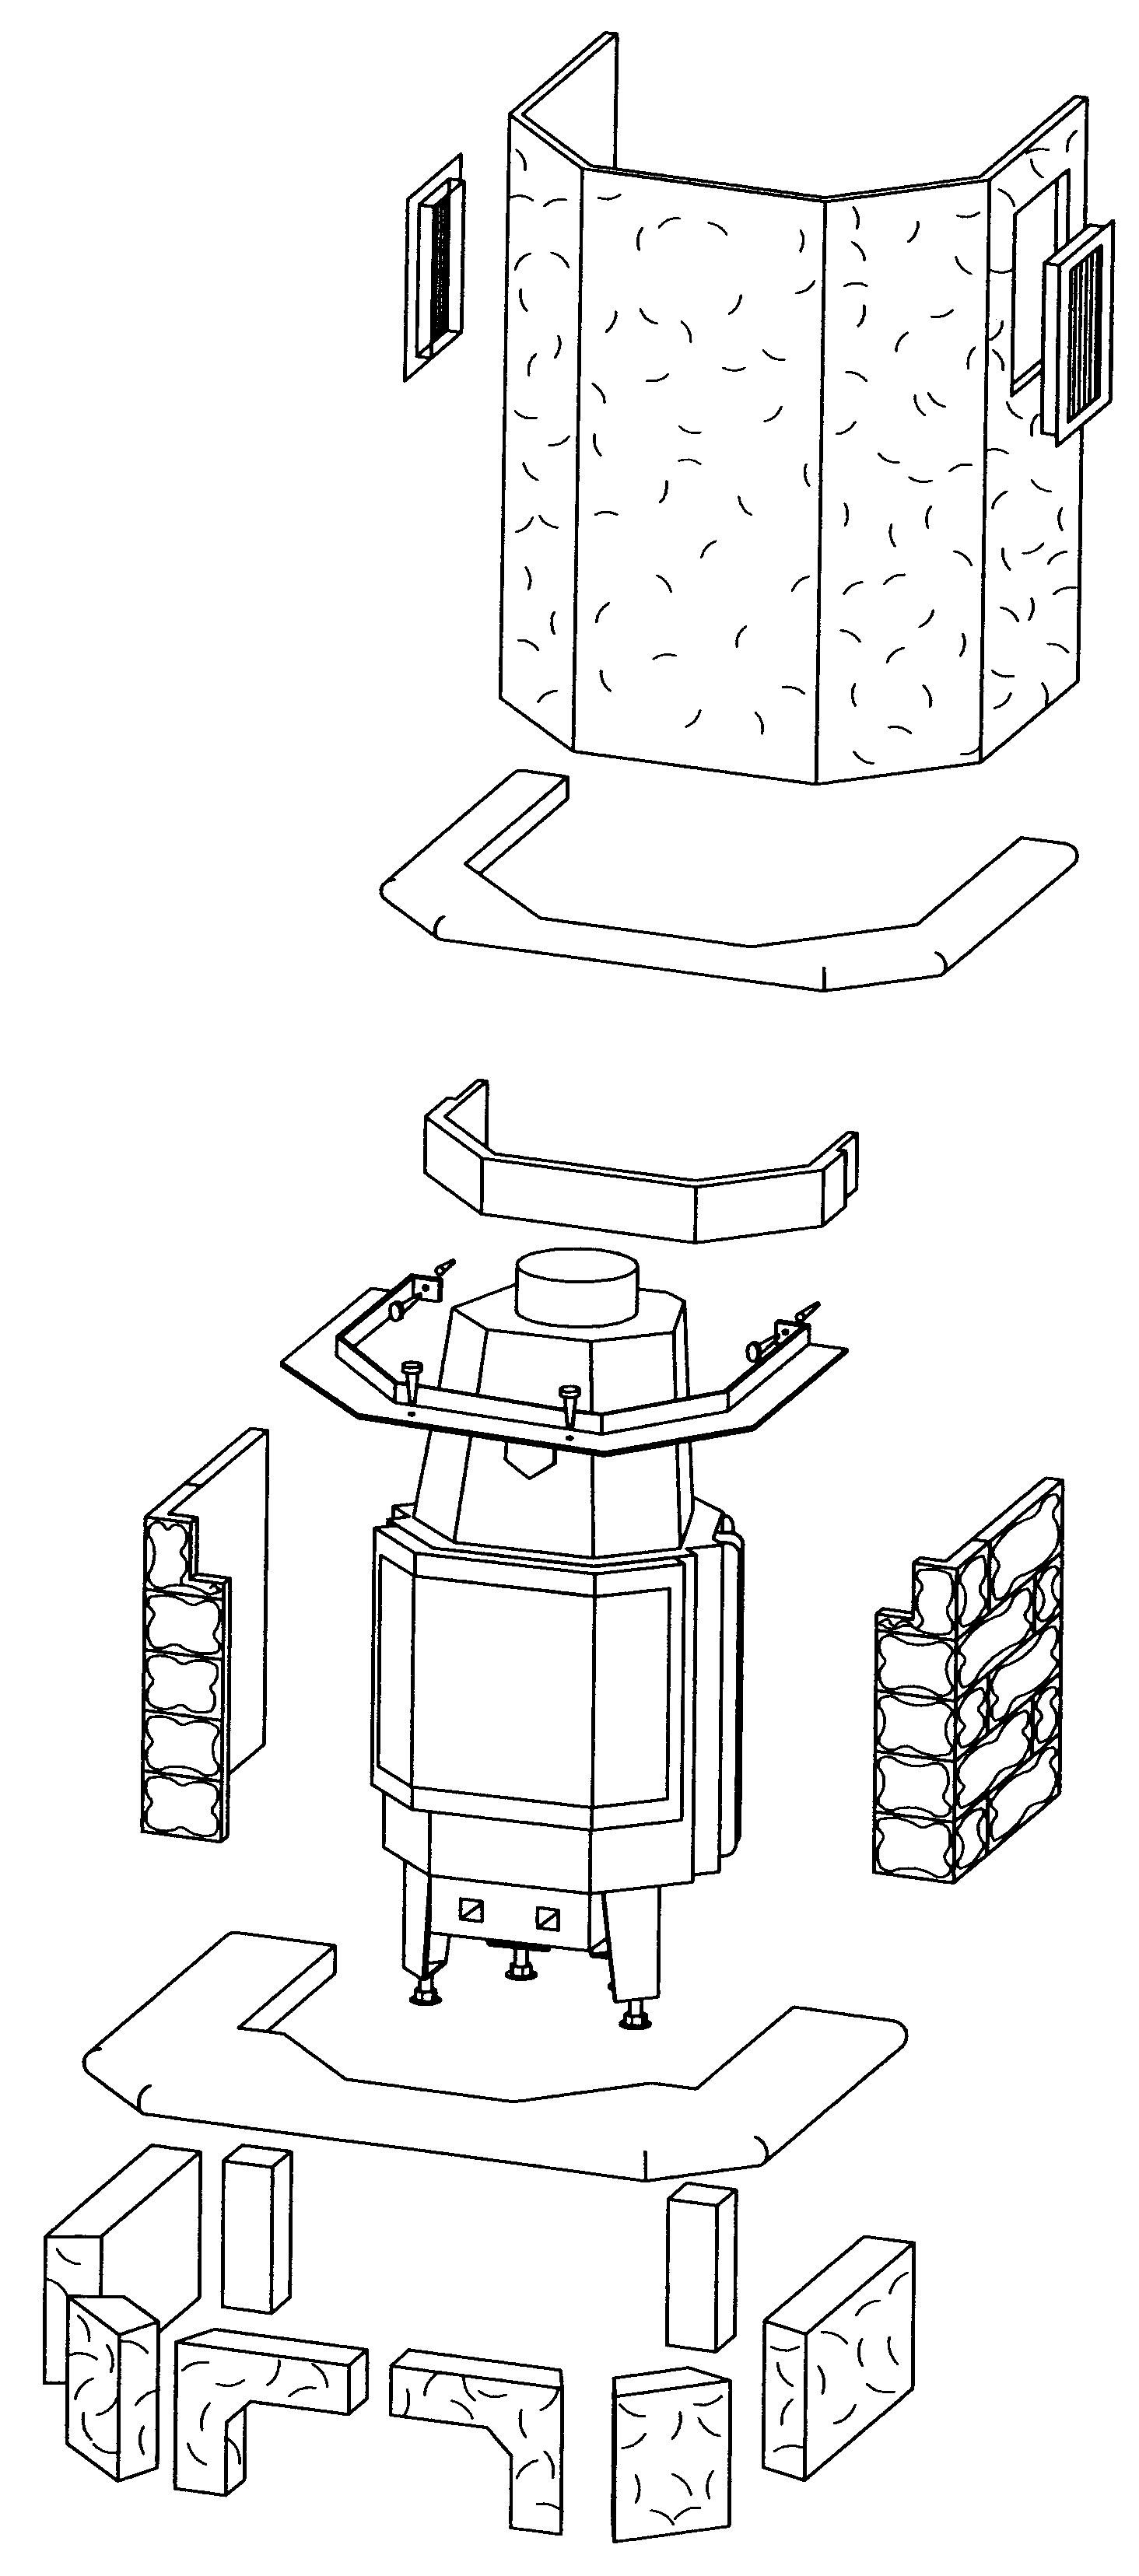 Kaminbausatz Hark Aspen mit Radiante 800/45K Marmor Classico-Beige 8kW Bild 2